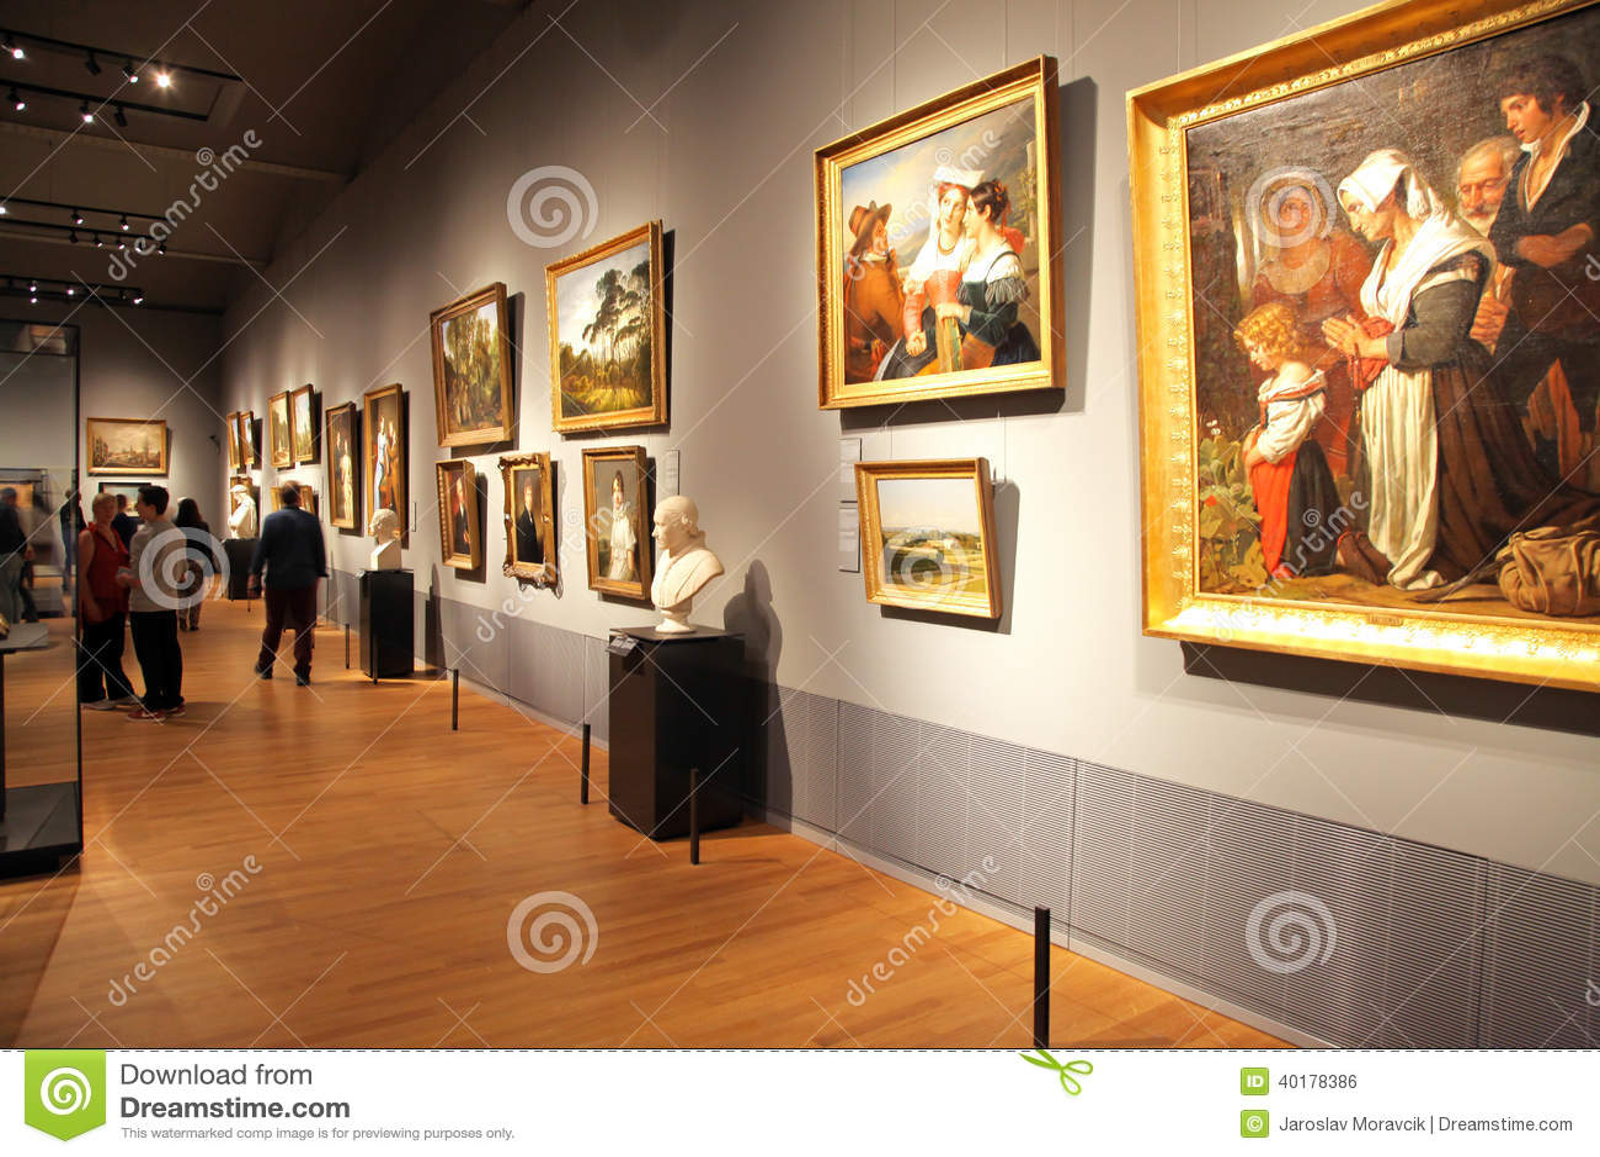 https://thumbs.dreamstime.com/z/interior-rijksmuseum-amsterdam-netherlands-april-city-april-40178386.jpg